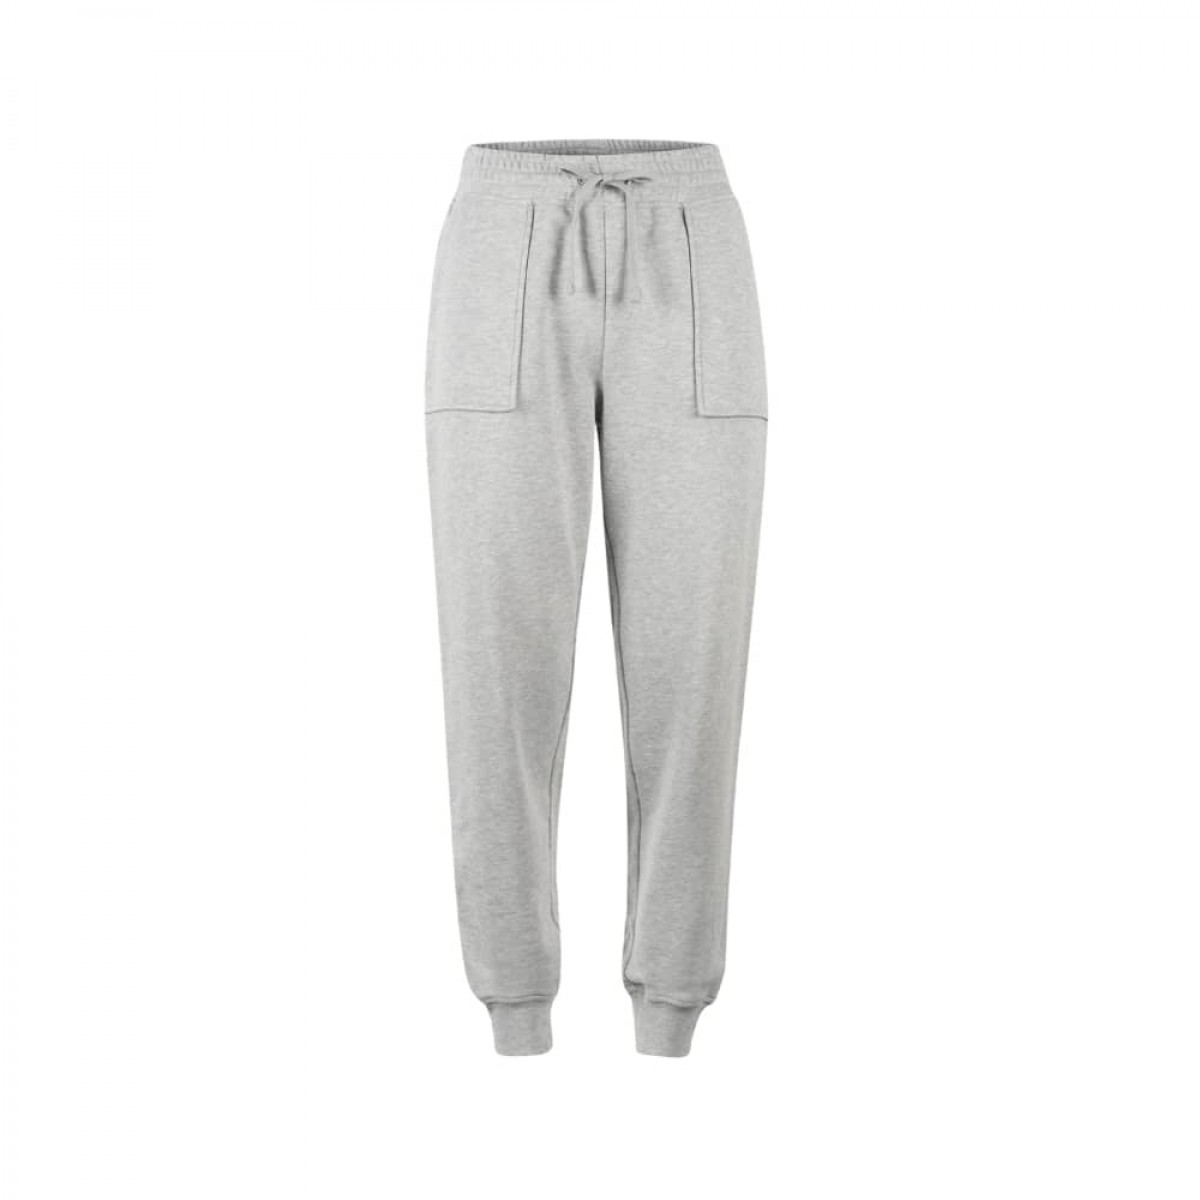 phine sweatpants - grey melange - front